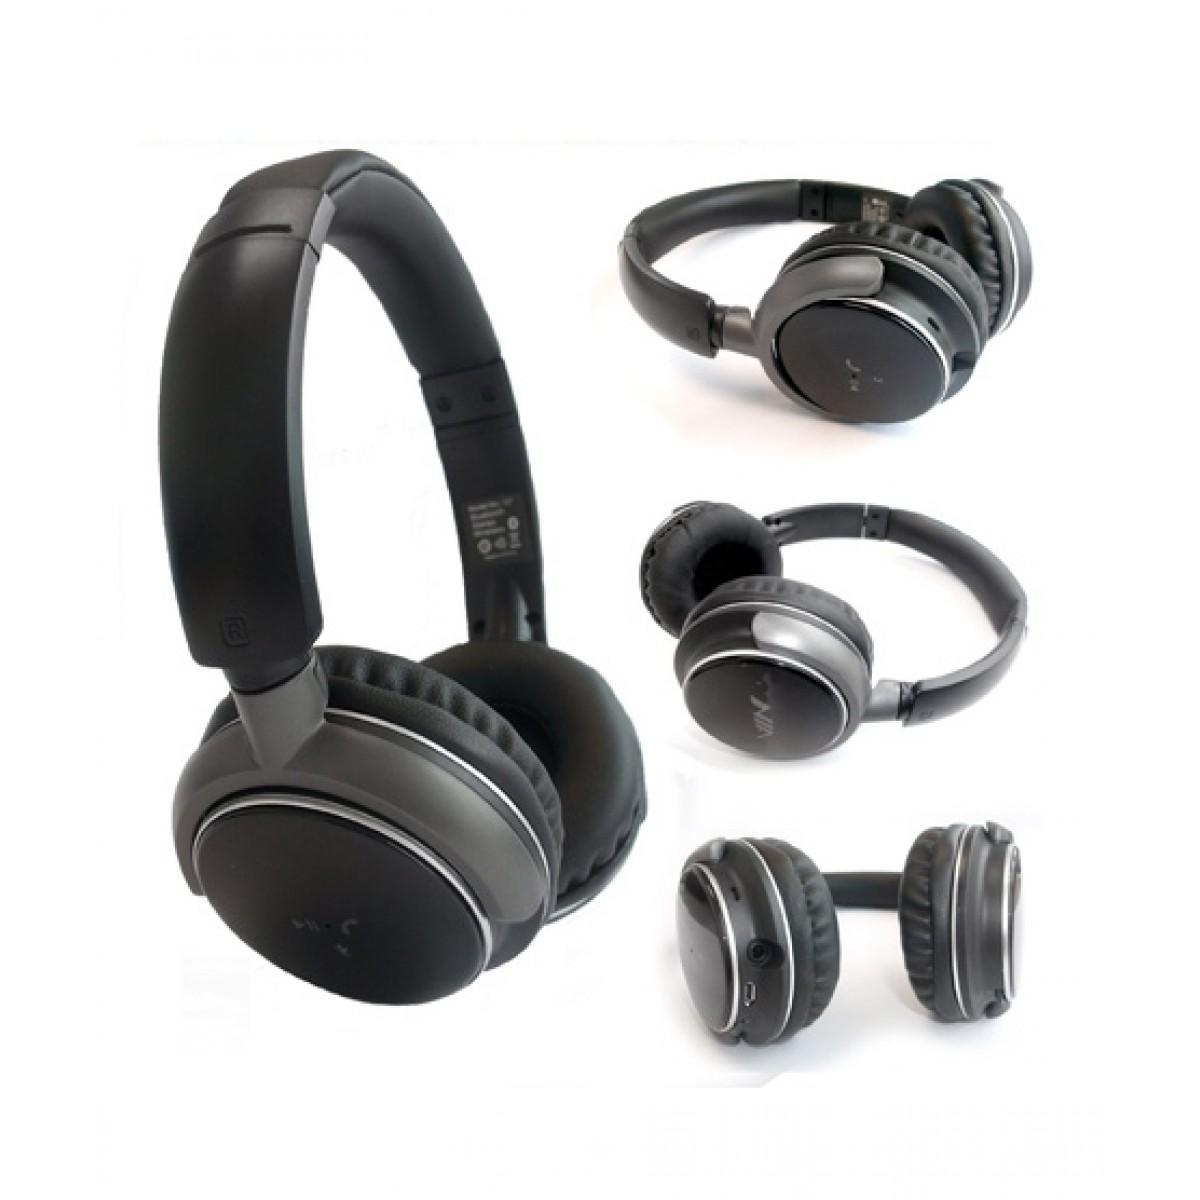 Nia Q1 Bluetooth Wireless Headphones Tech Savings